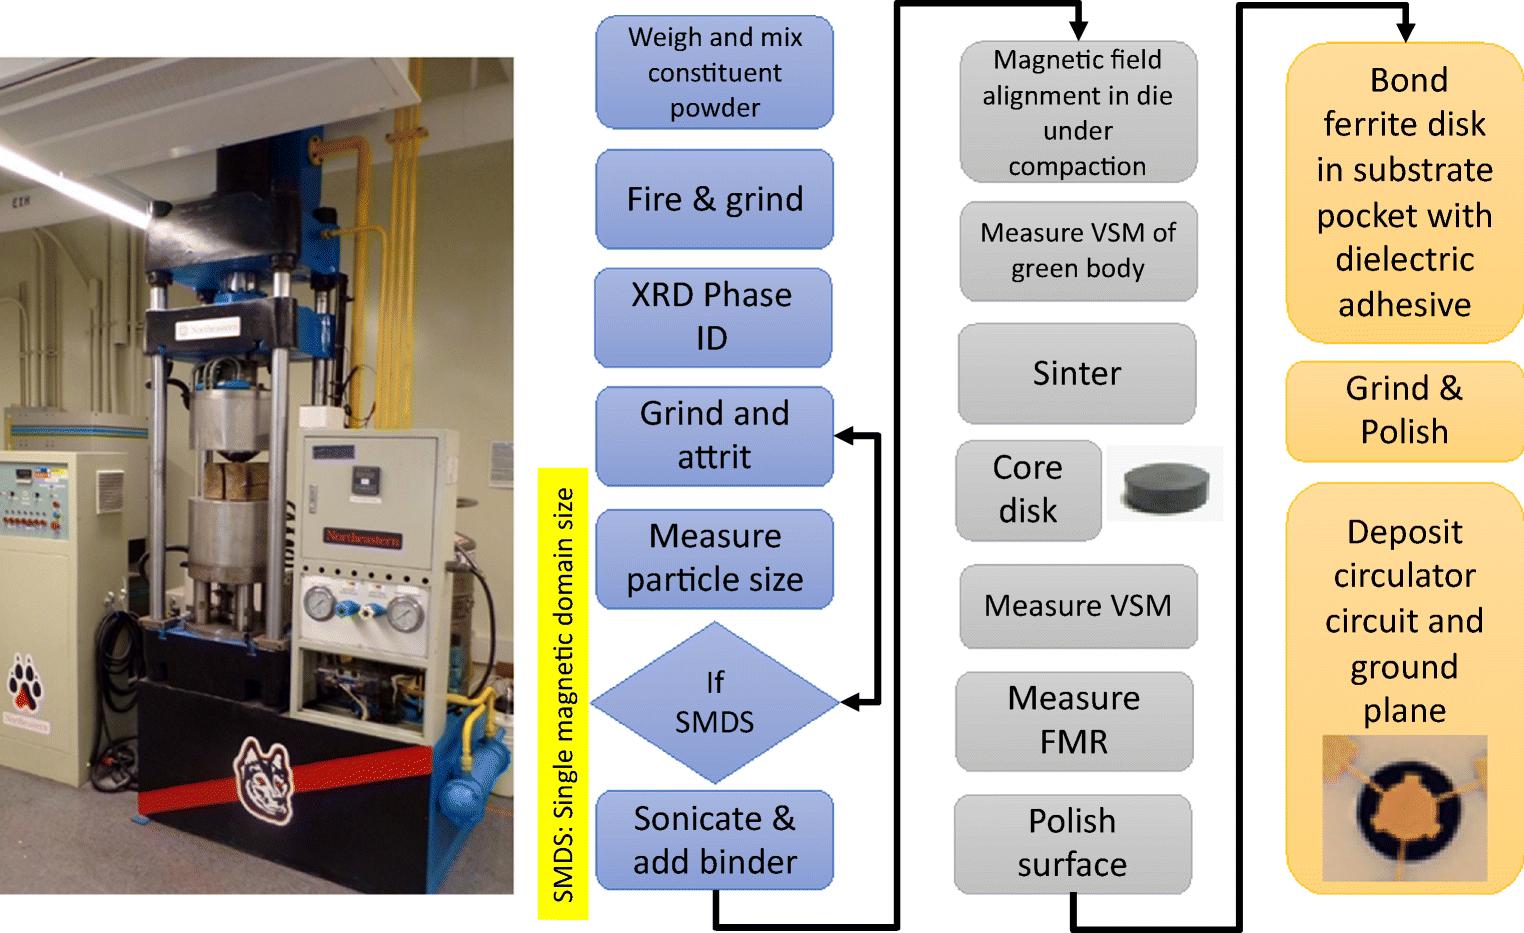 The Self-Biased Circulator: Ferrite Materials Design and Process